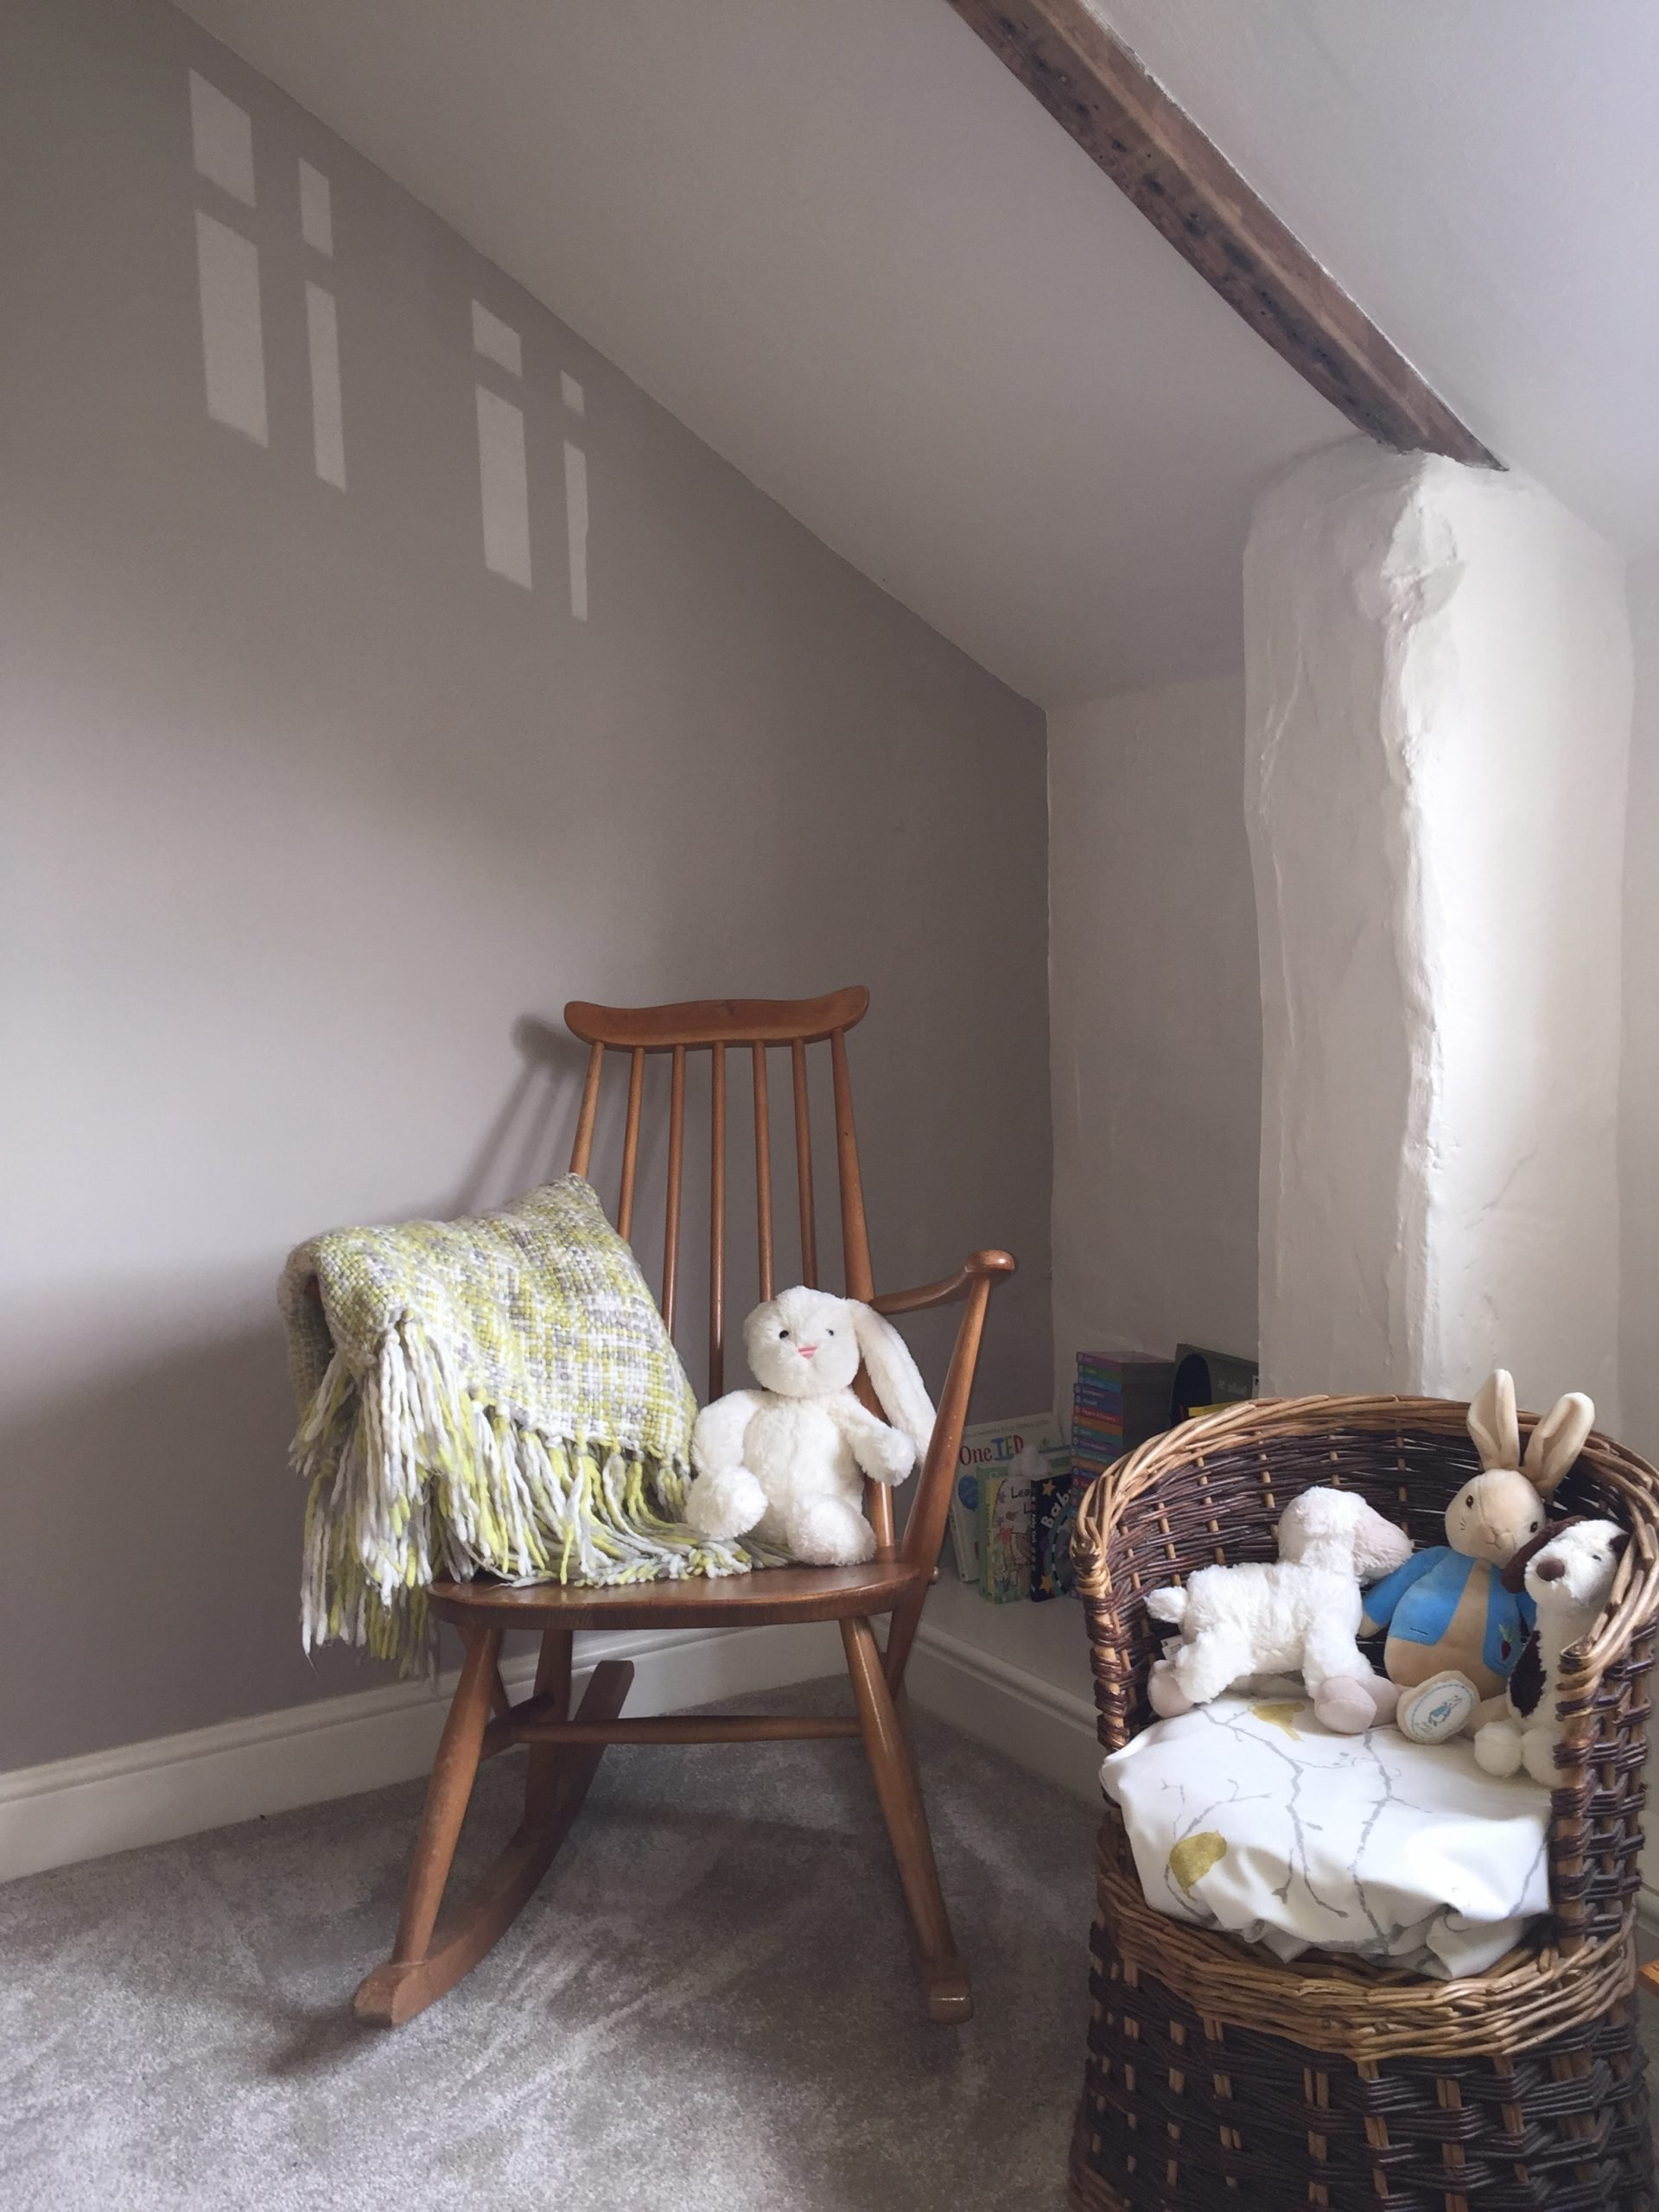 Design Penguin Portfolio Nursery corner of room with chairs